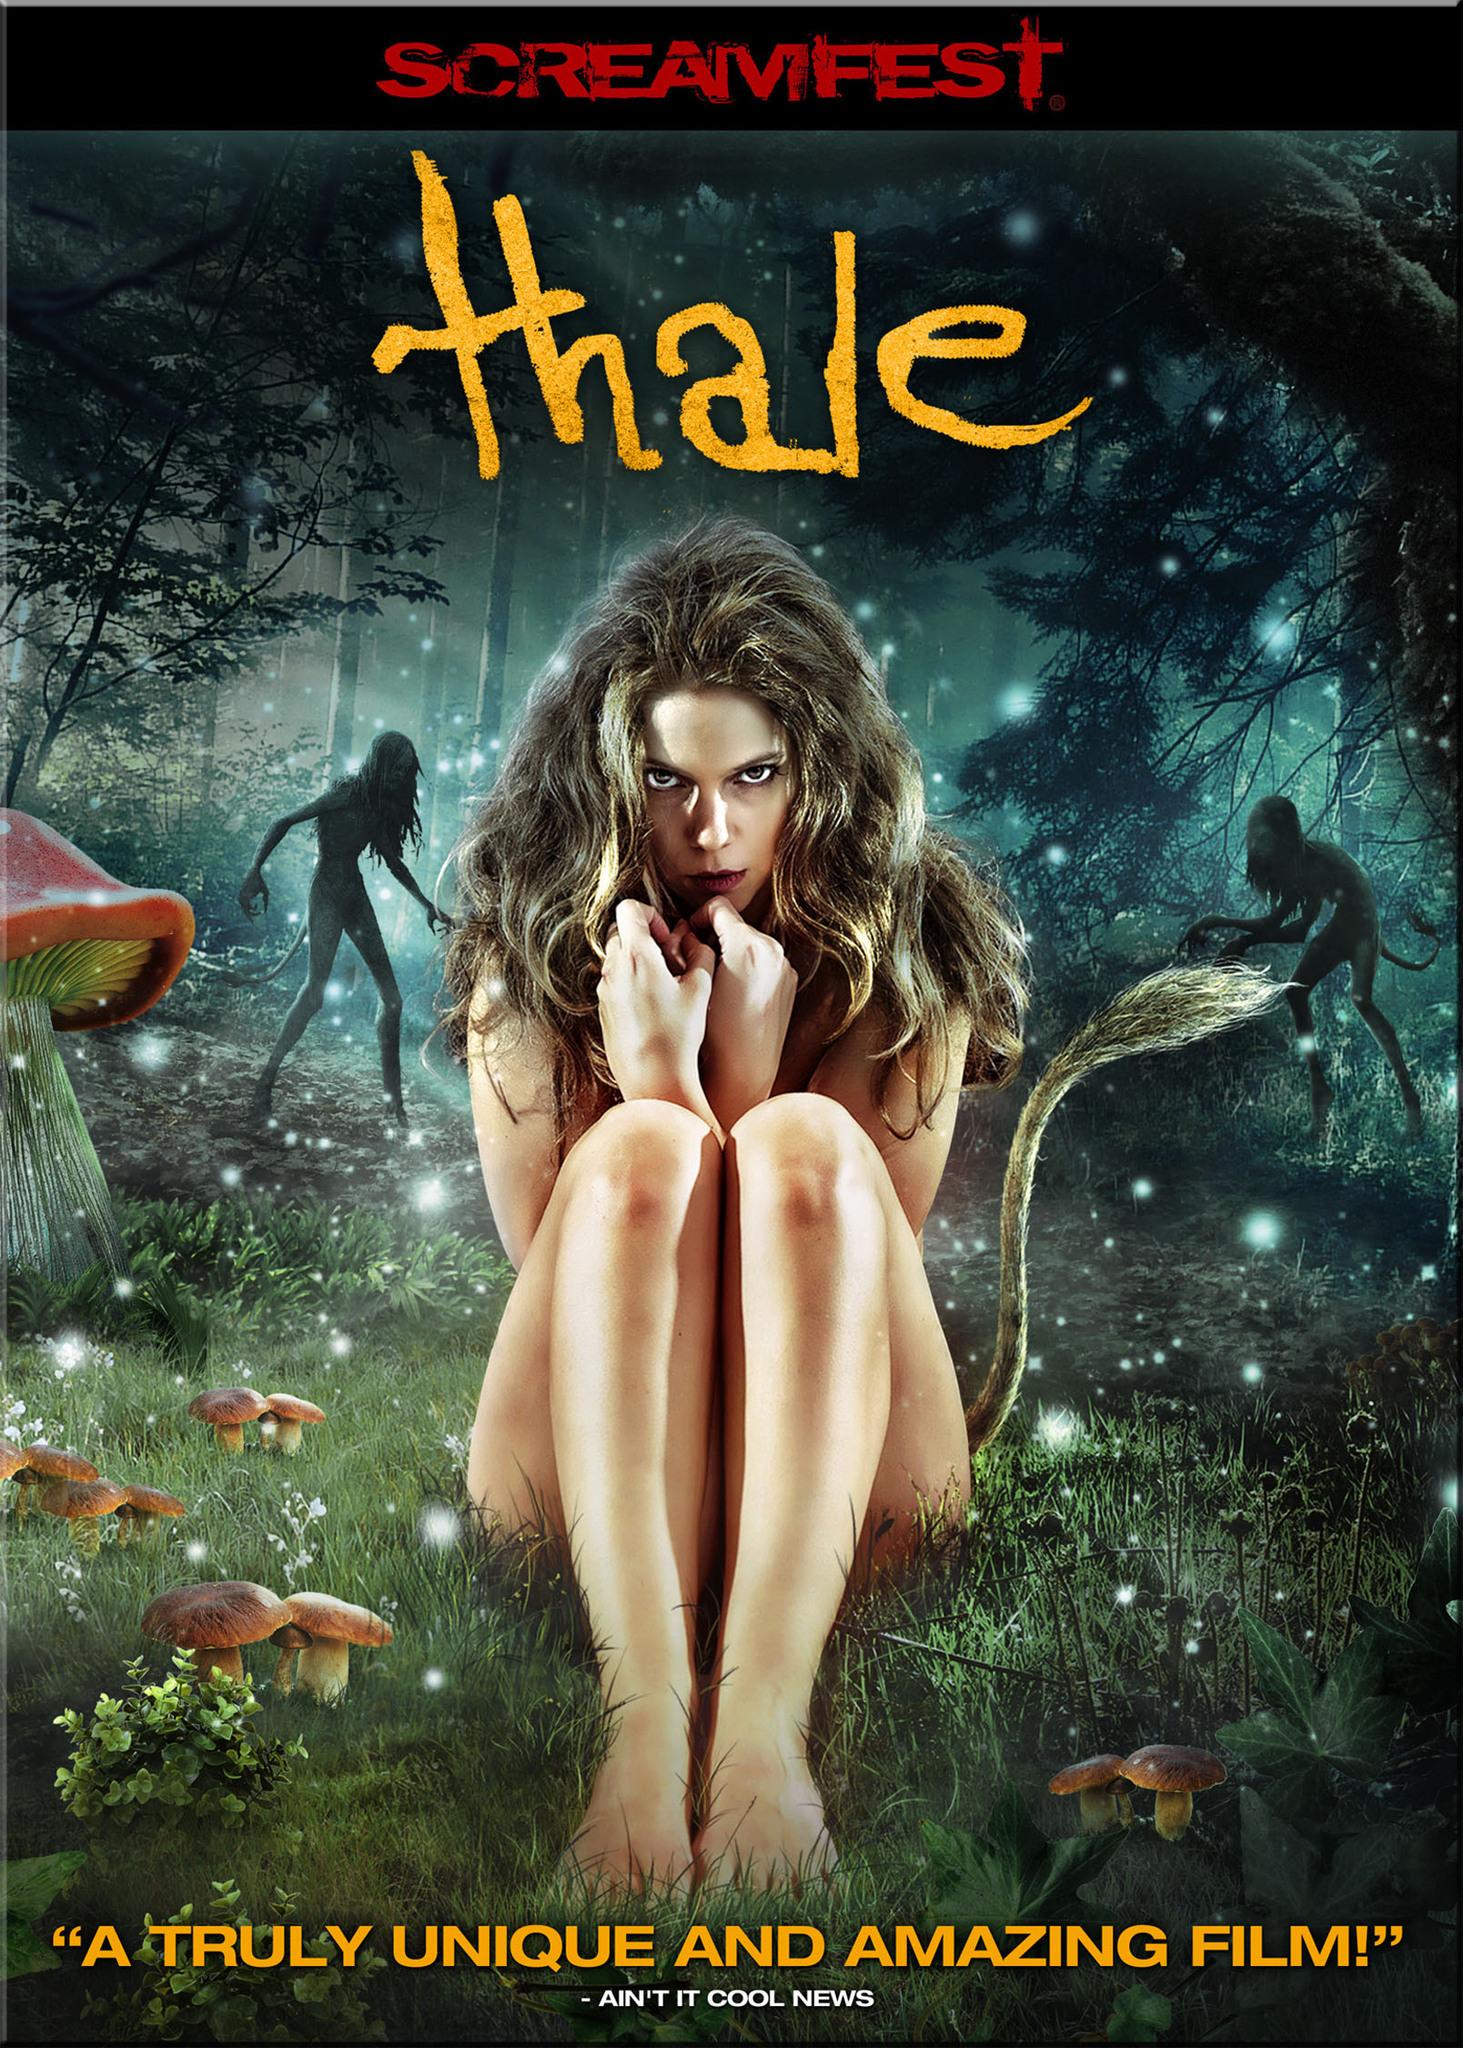 Thale 2012 Imdb